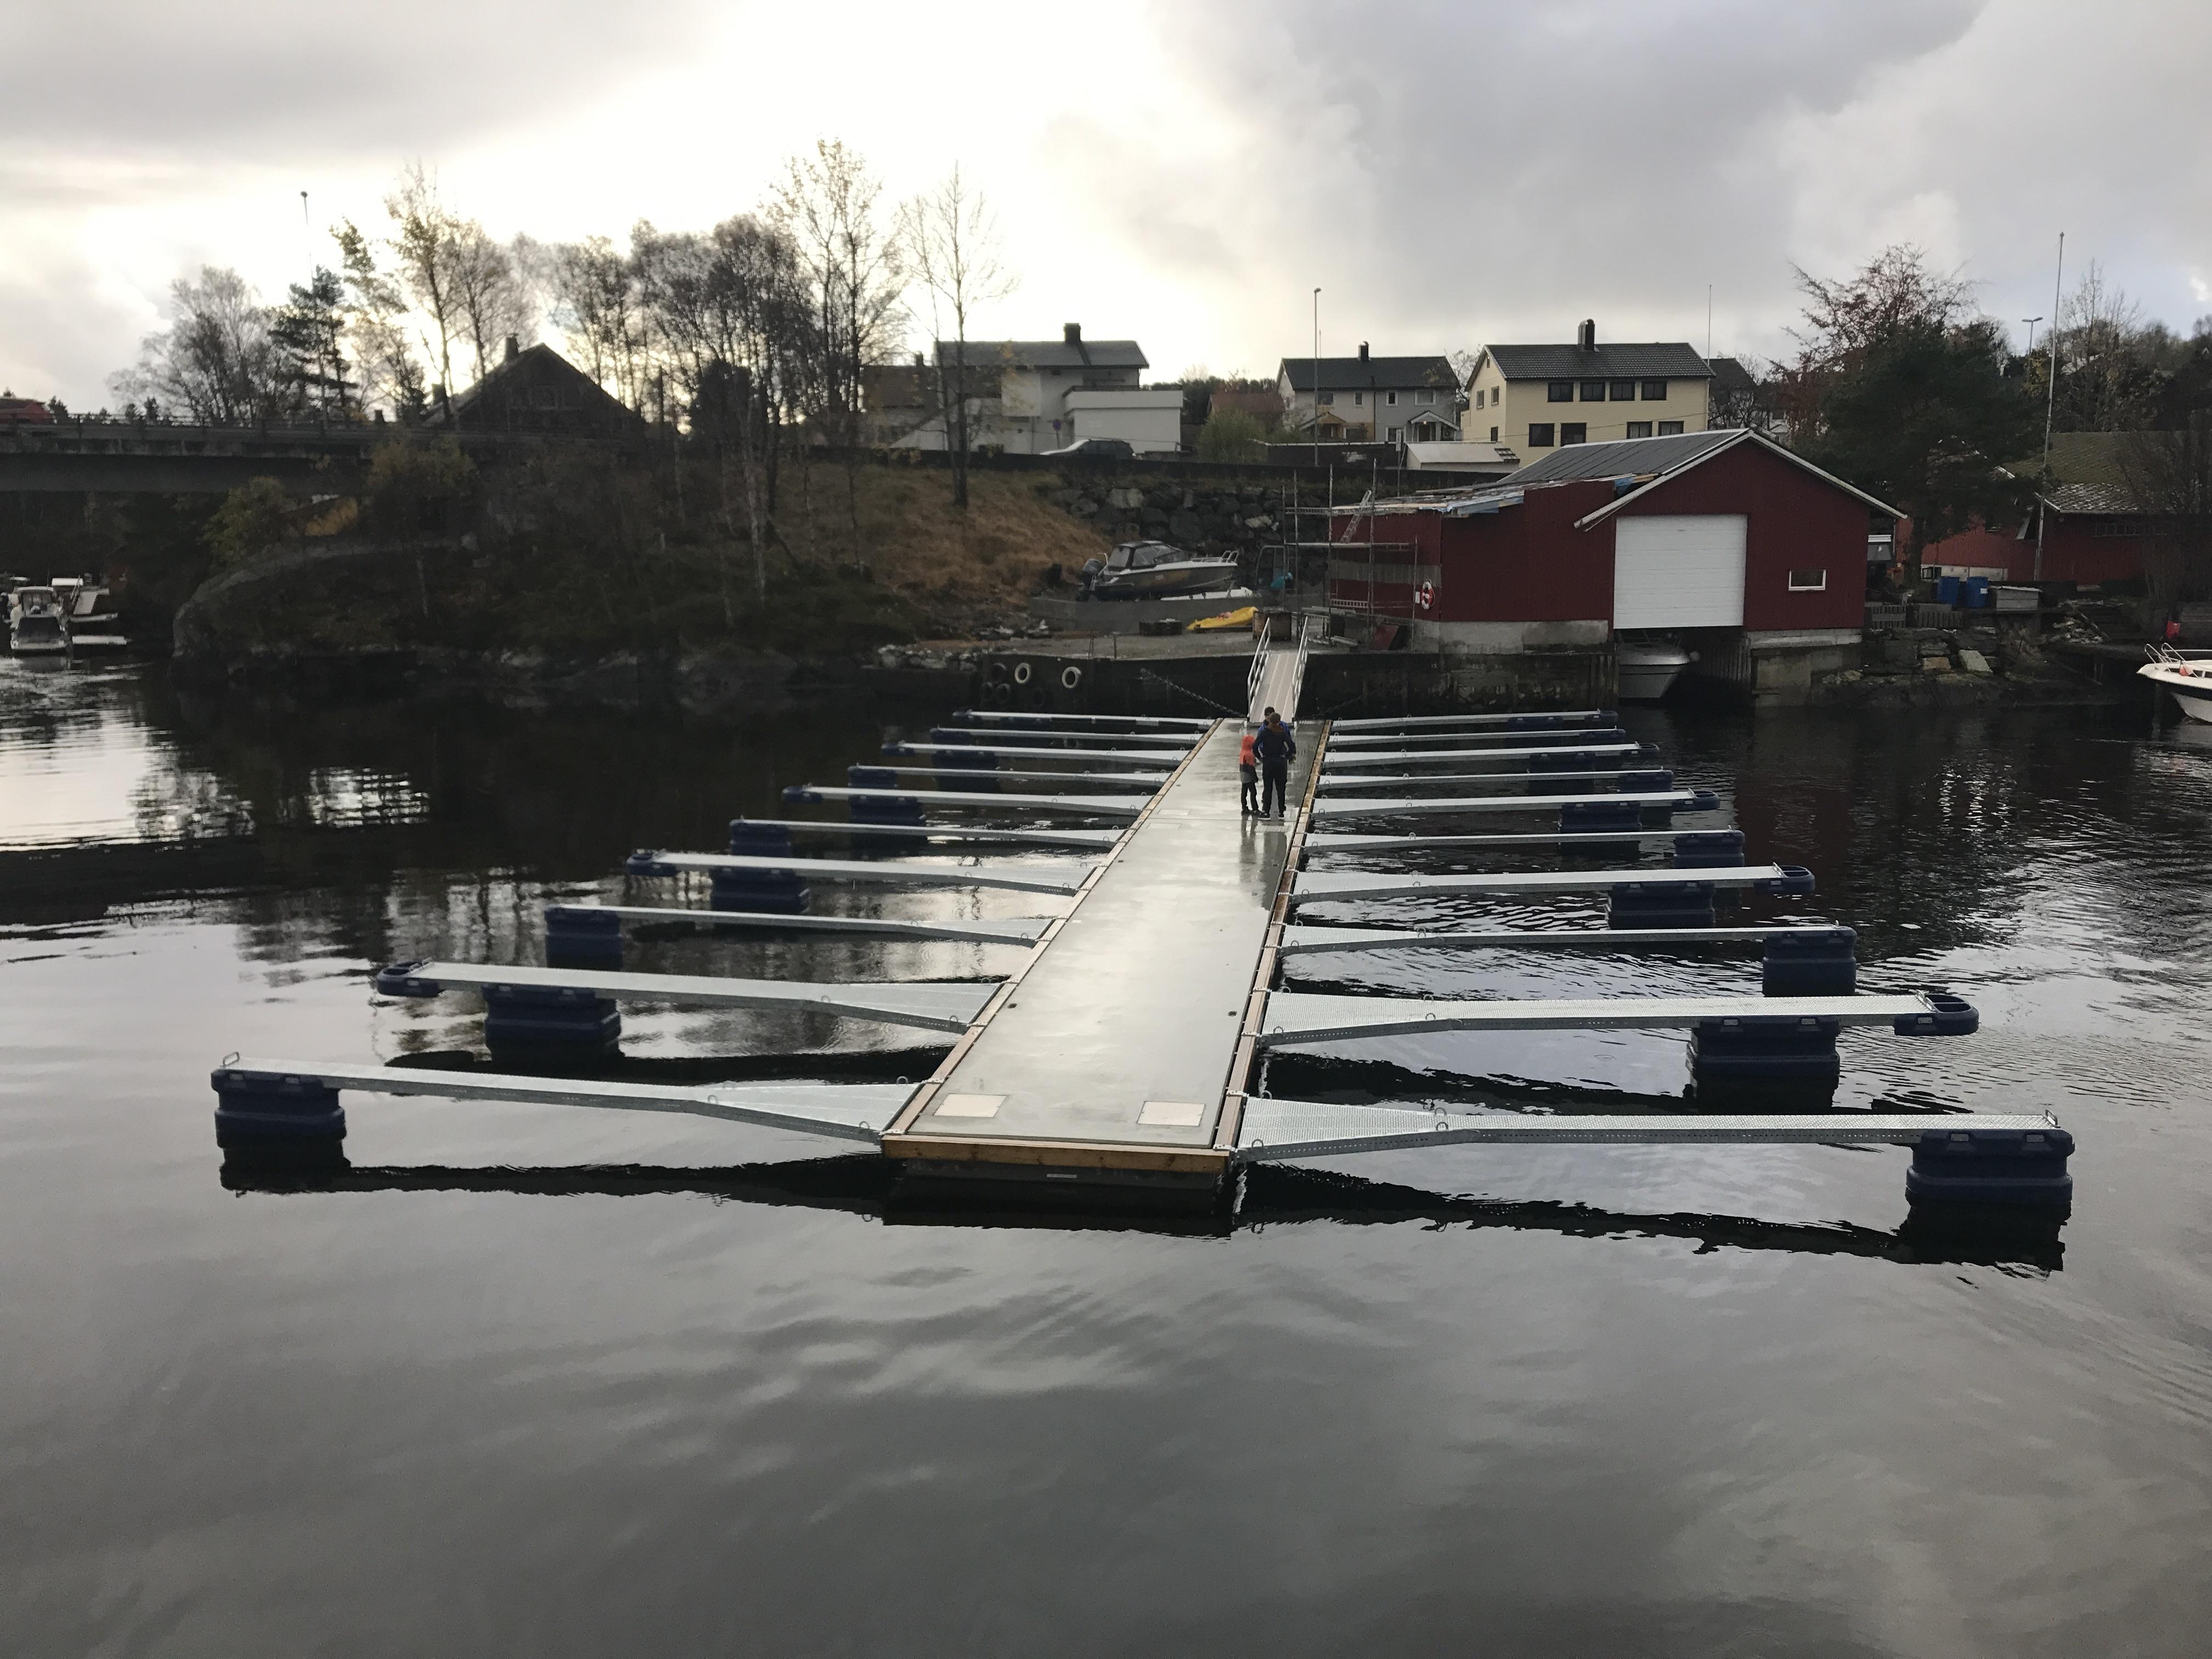 https://marinasolutions.no/uploads/Jarle-Tonheim-Florø-marina-solutions.JPG